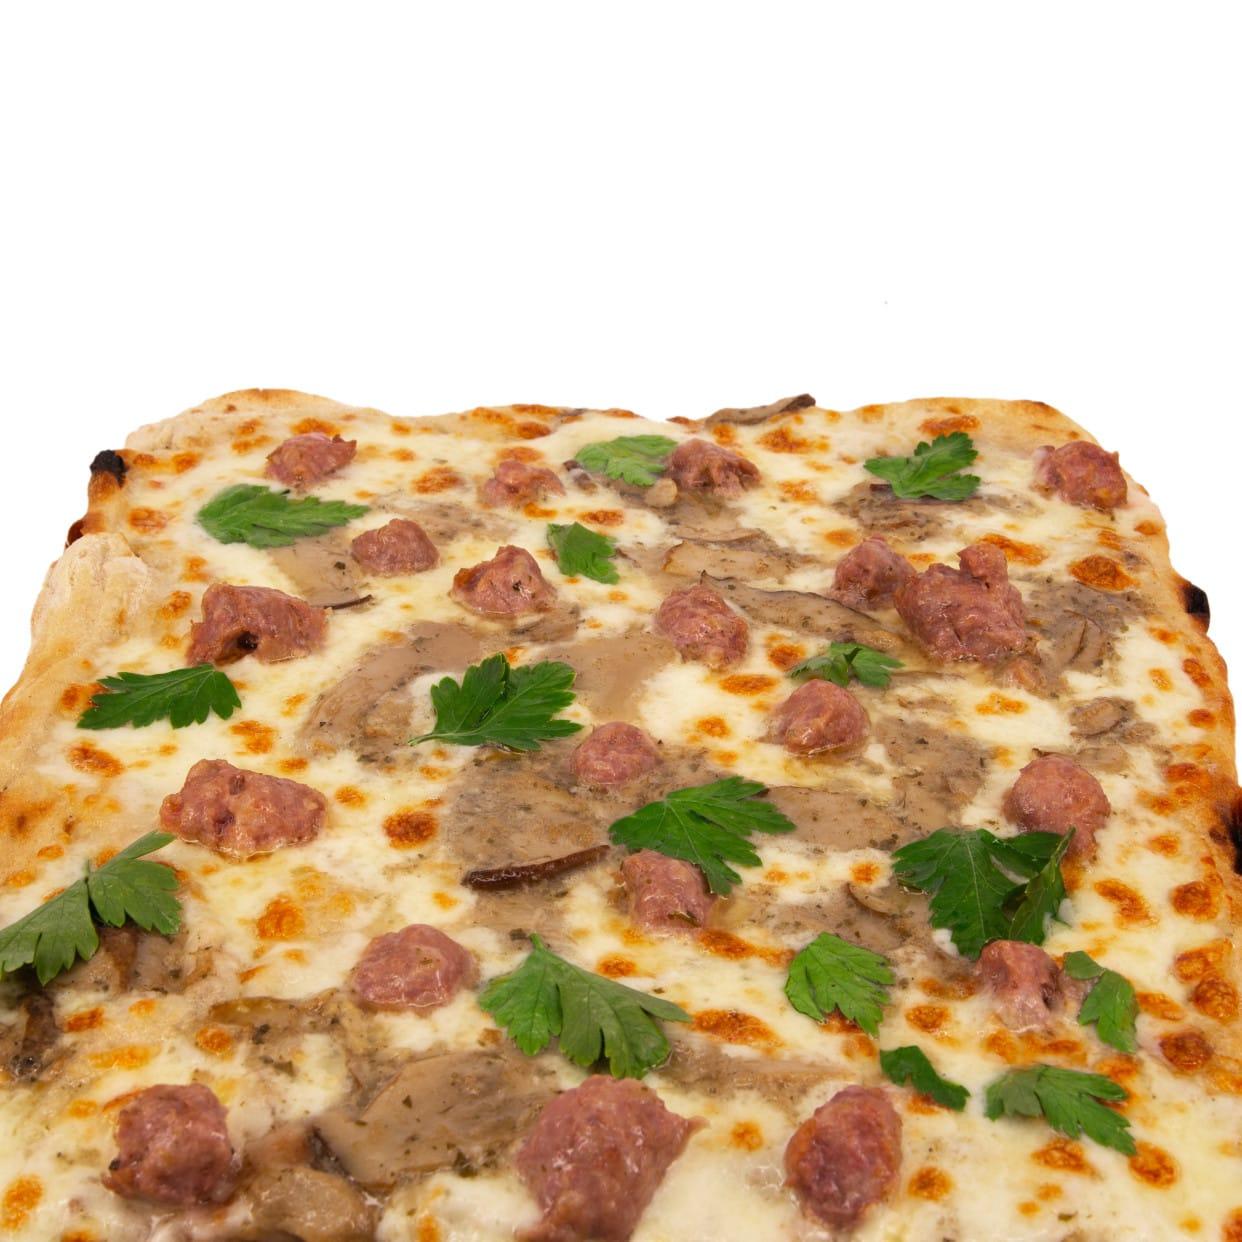 Pizza salsiccia e funghi porcini - pala intera